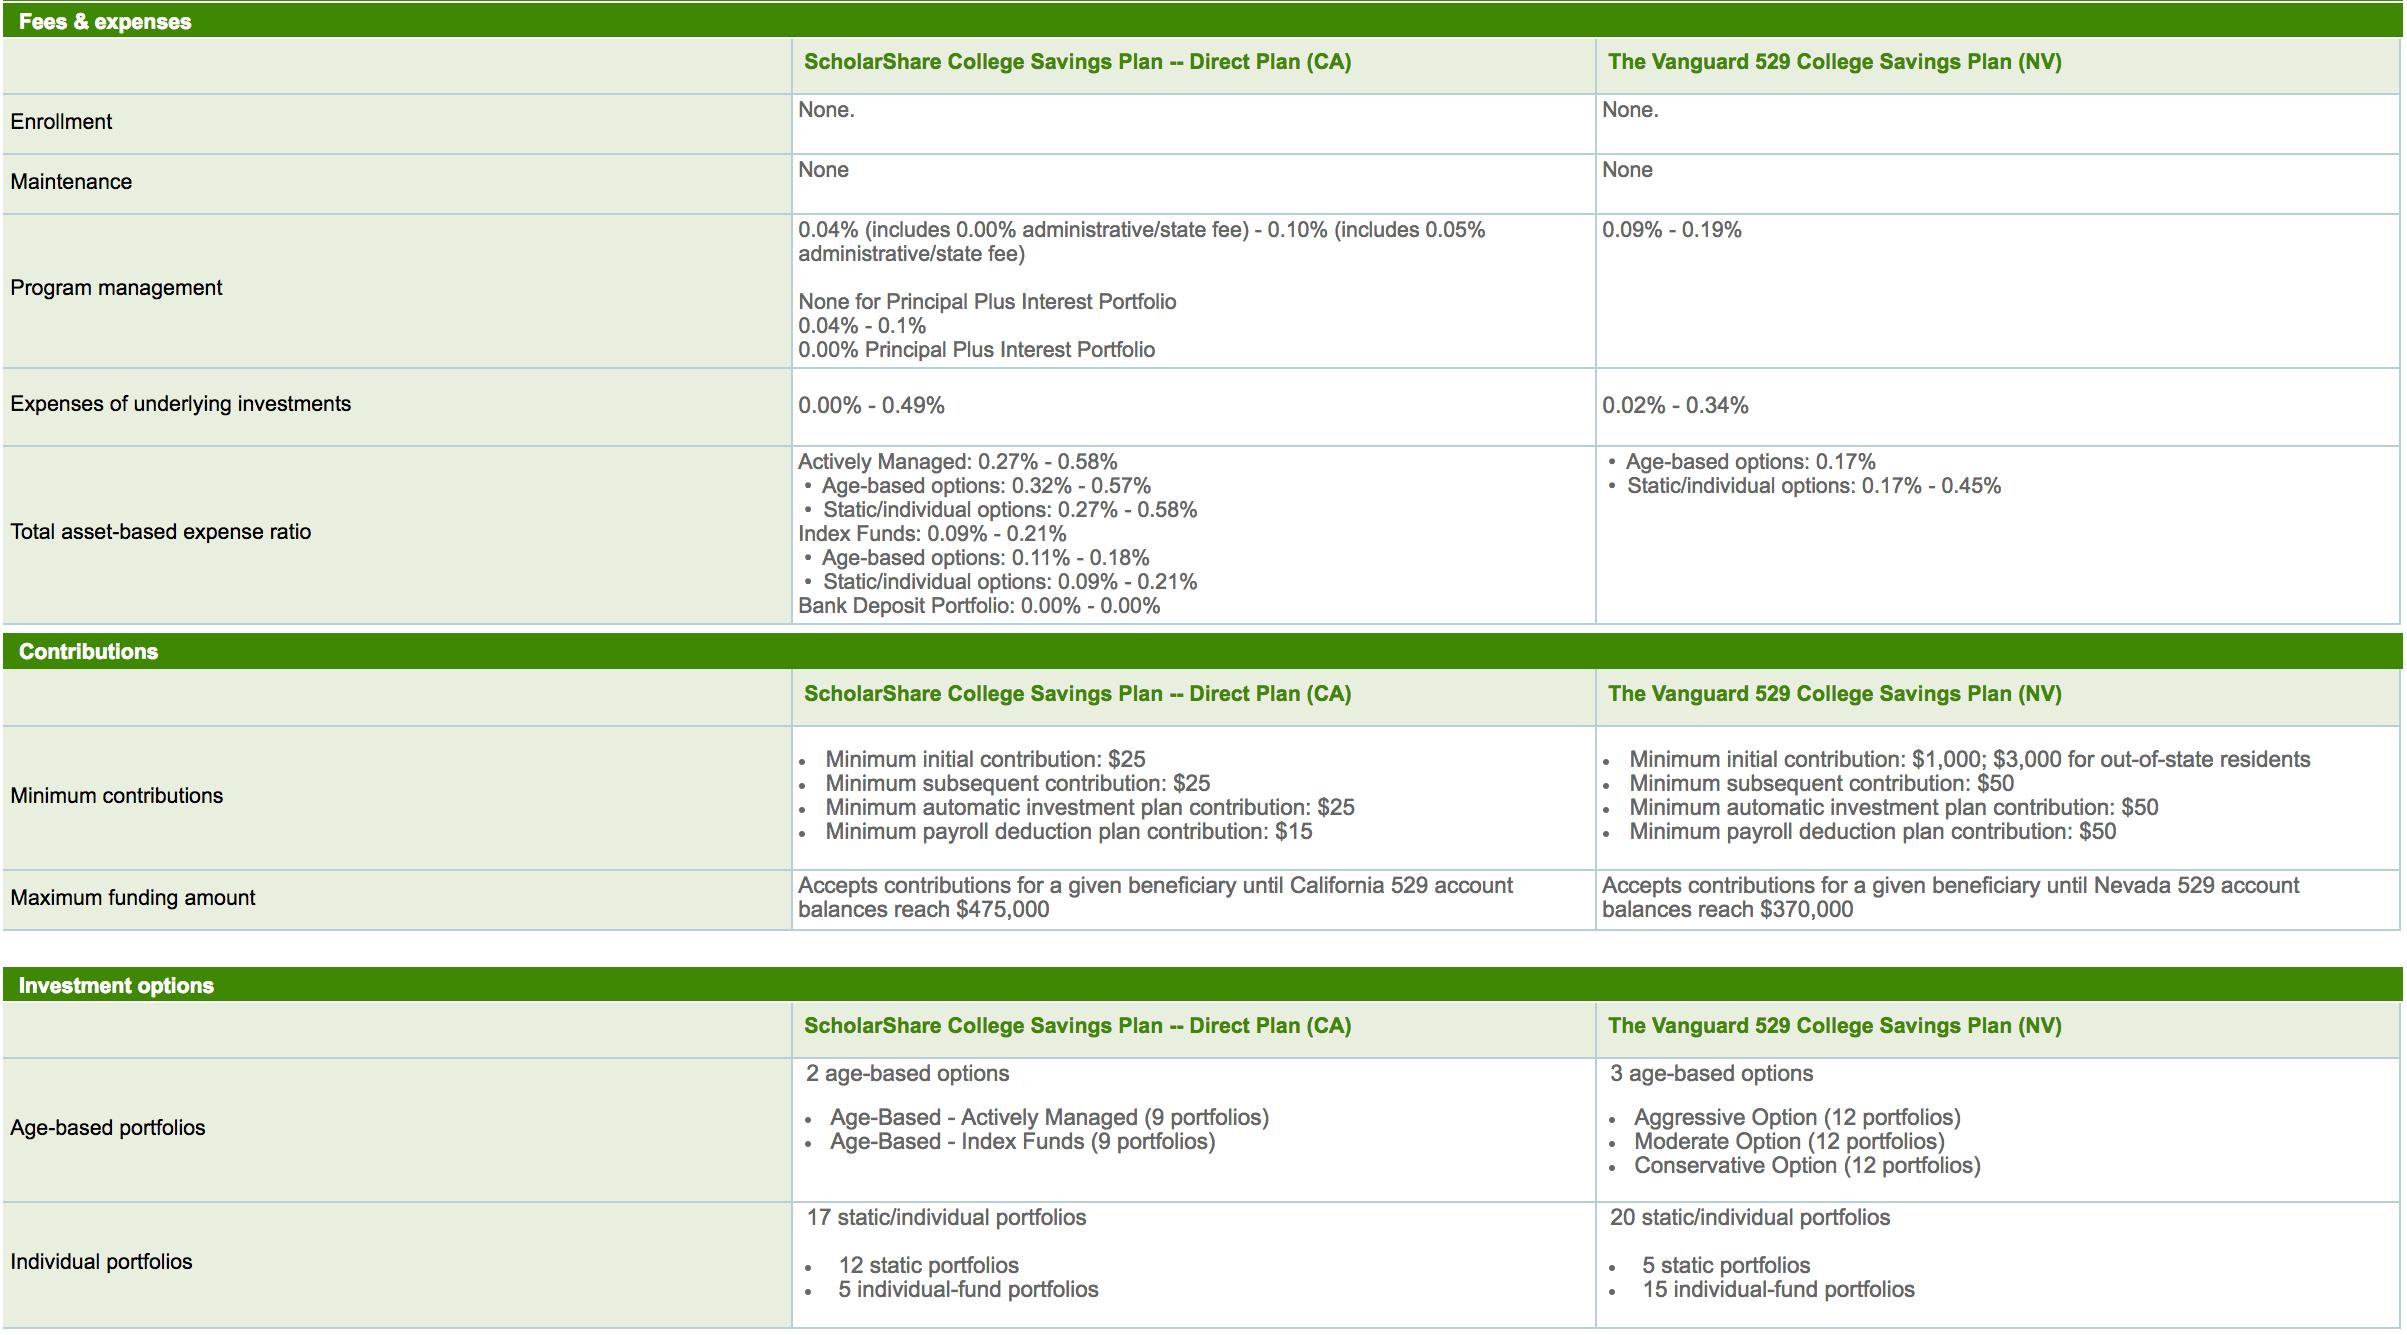 529 Plan Comparison Between California TIAA-CREF and Nevada Vanguard